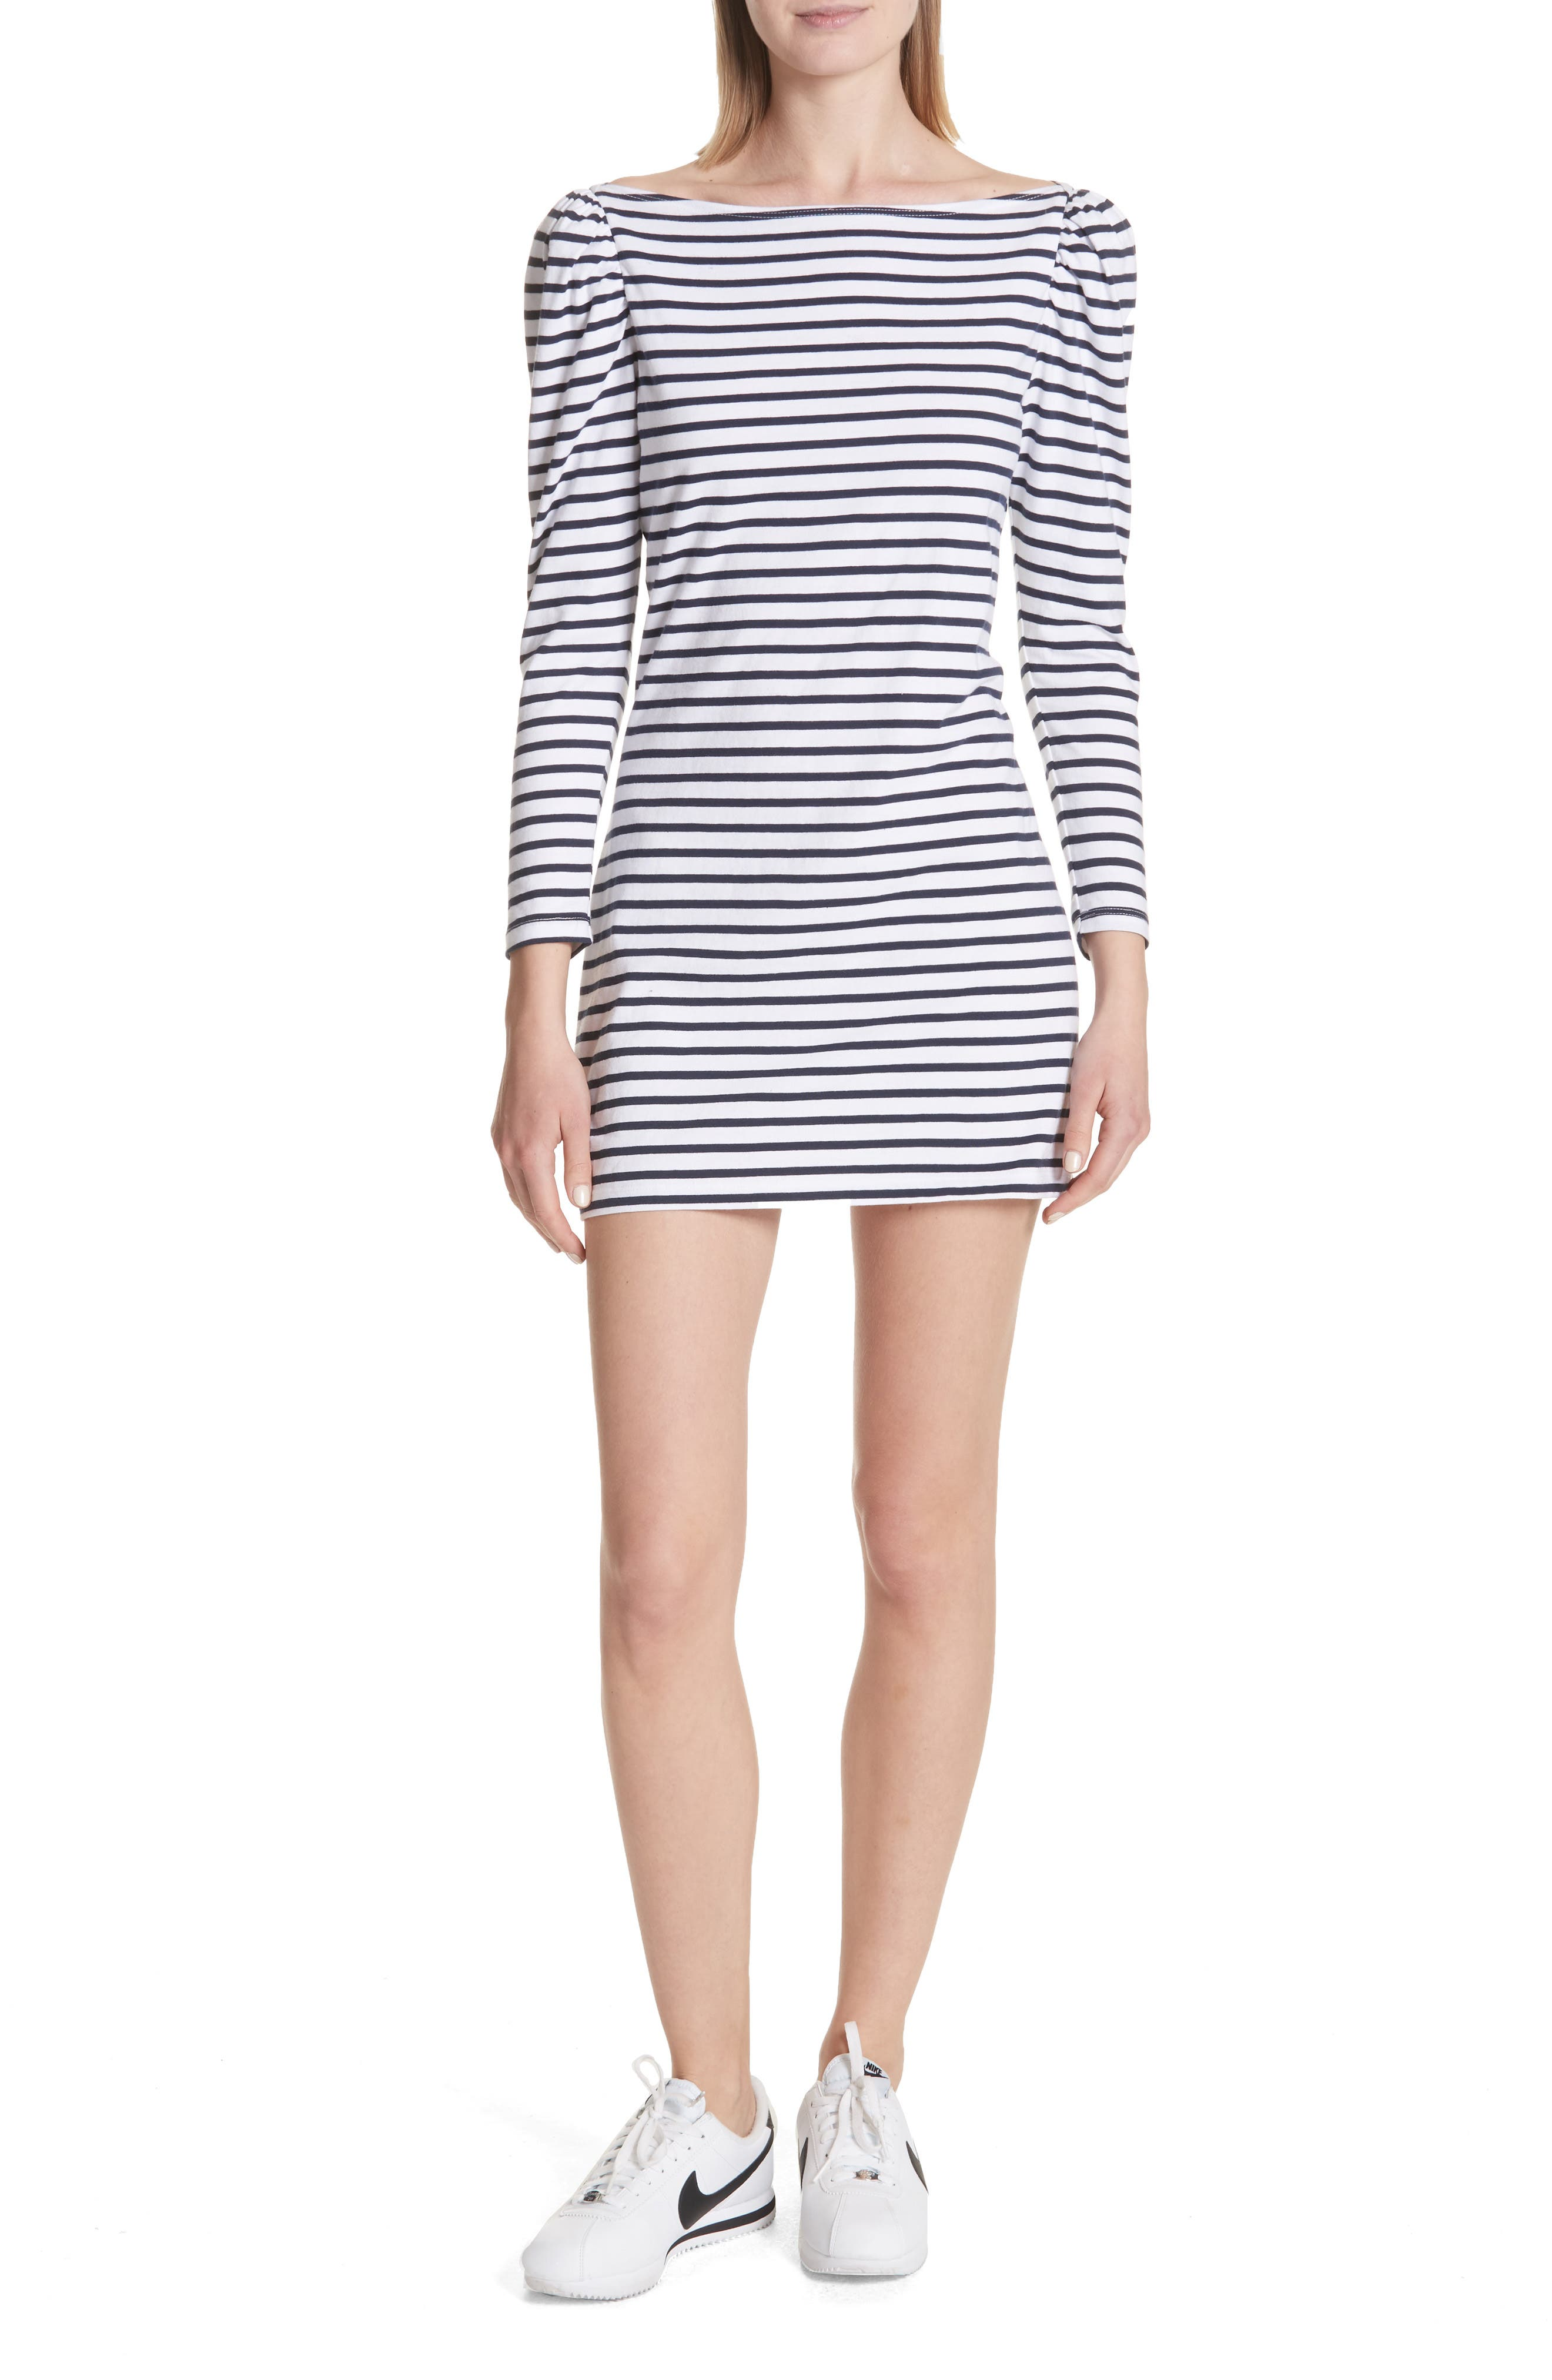 A.L.C. Stevens Stripe Dress